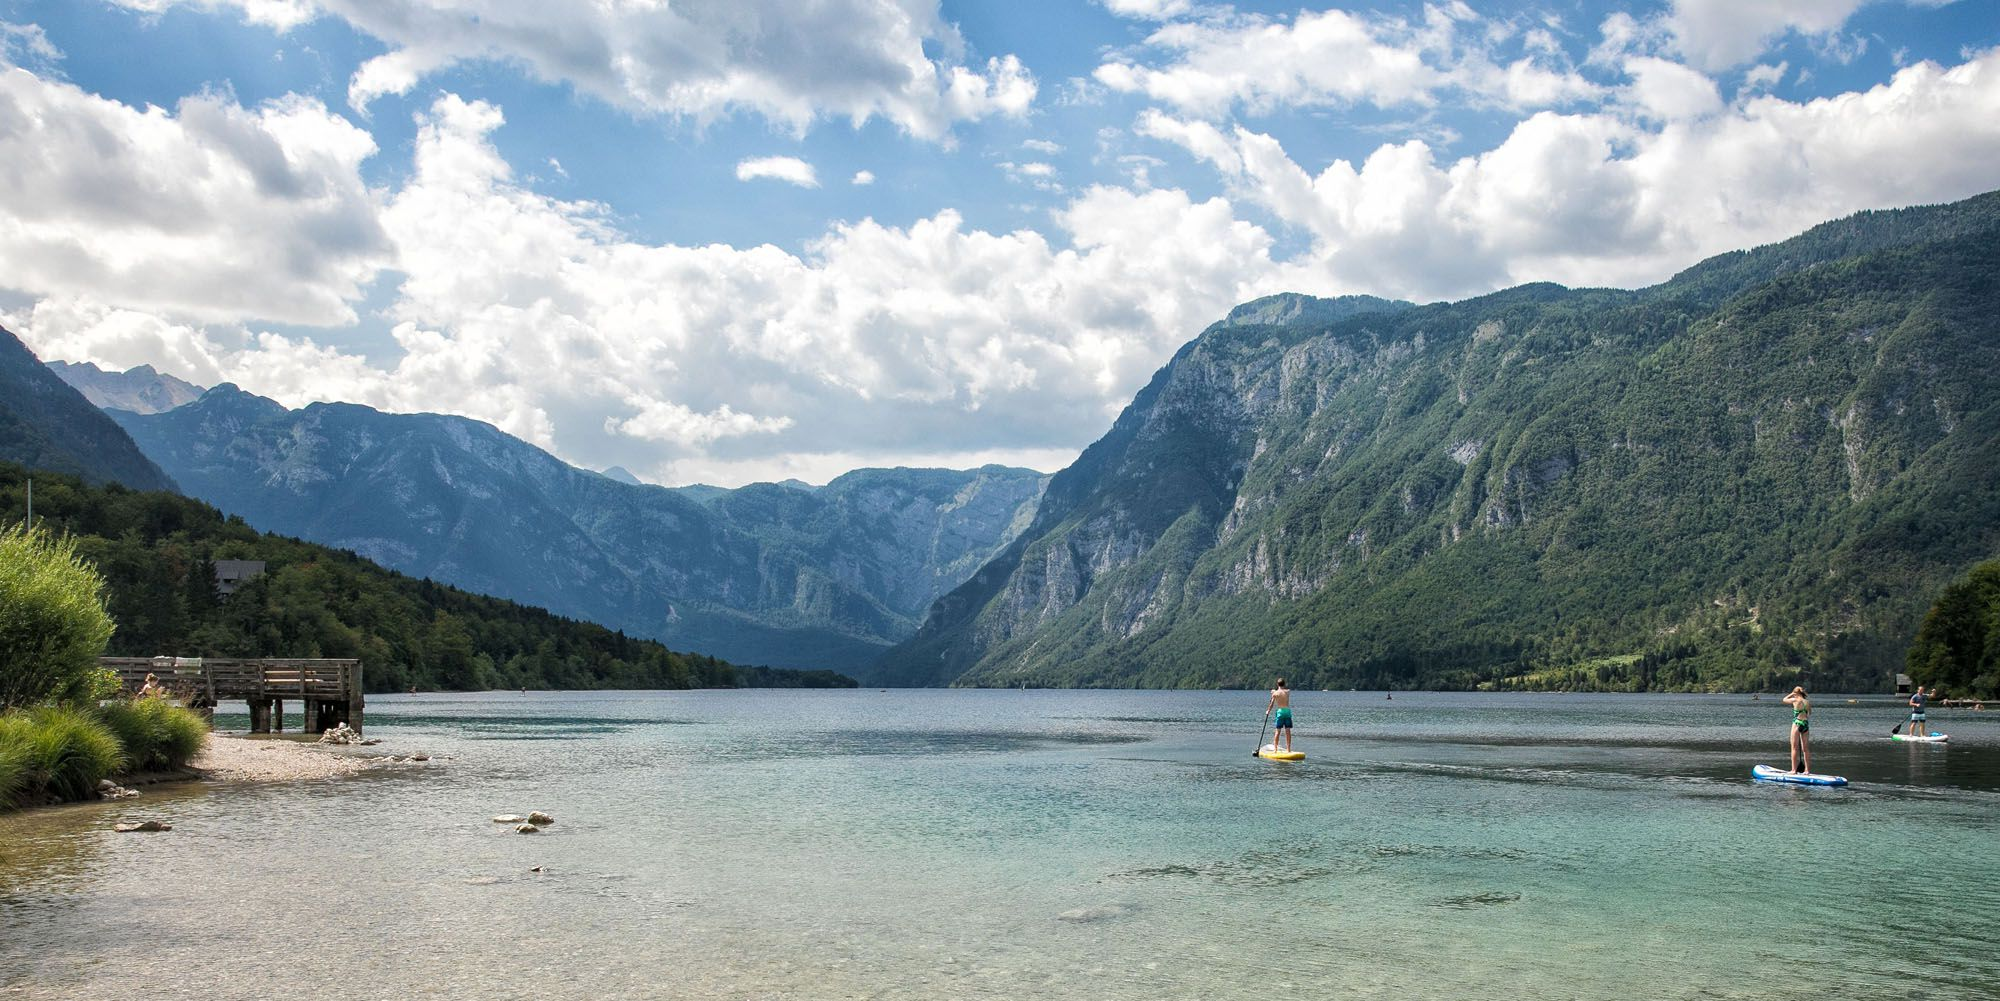 Things to do in Lake Bohinj